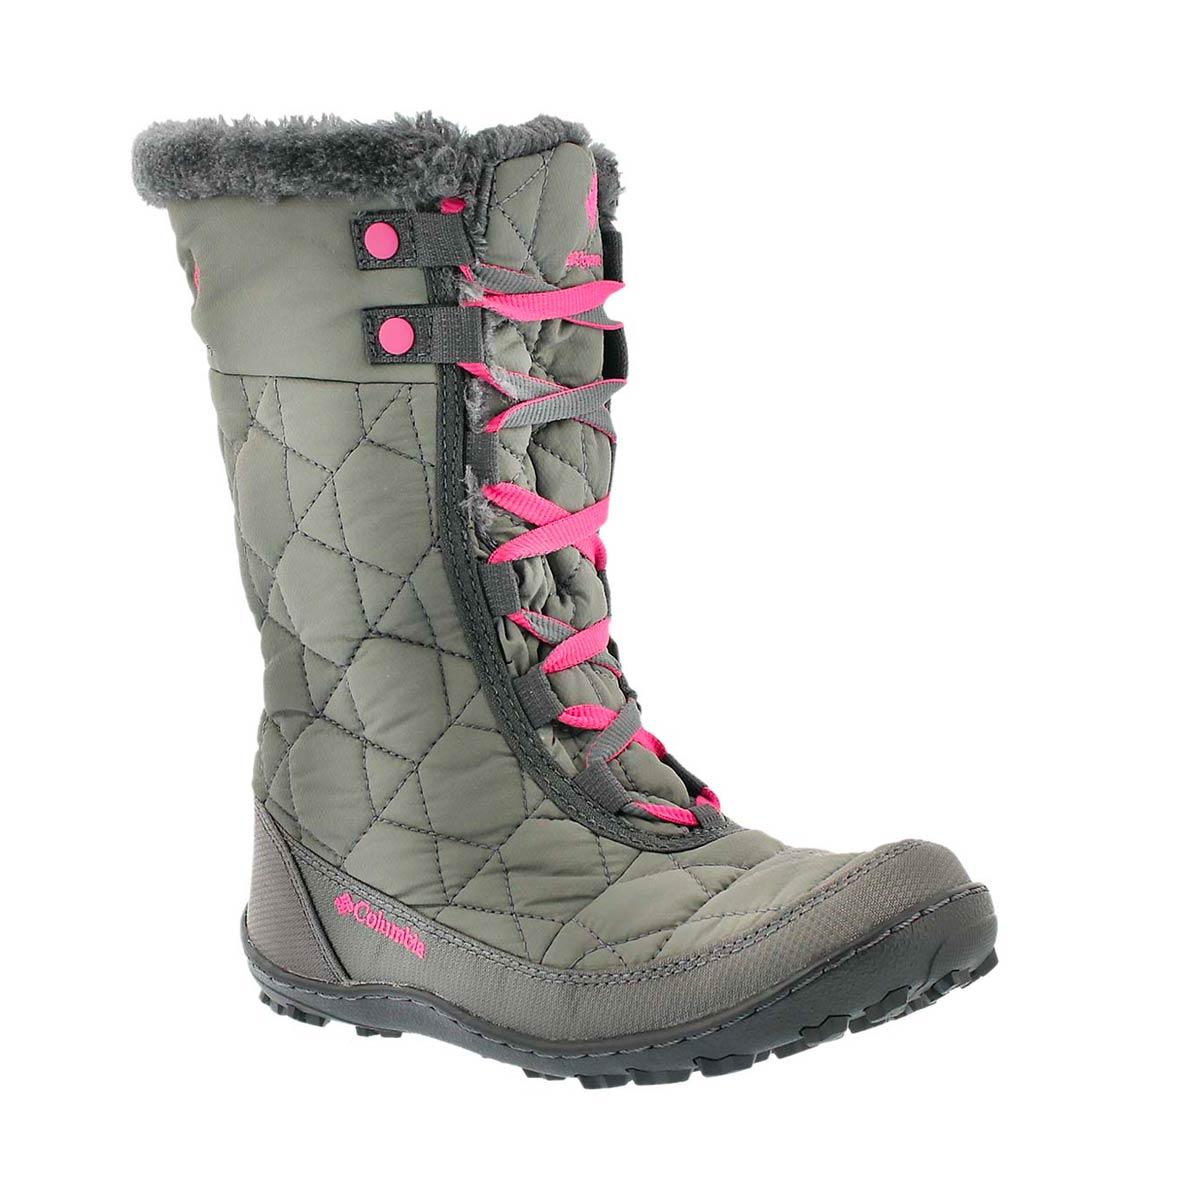 Girls' MINX MID II grey winter boots